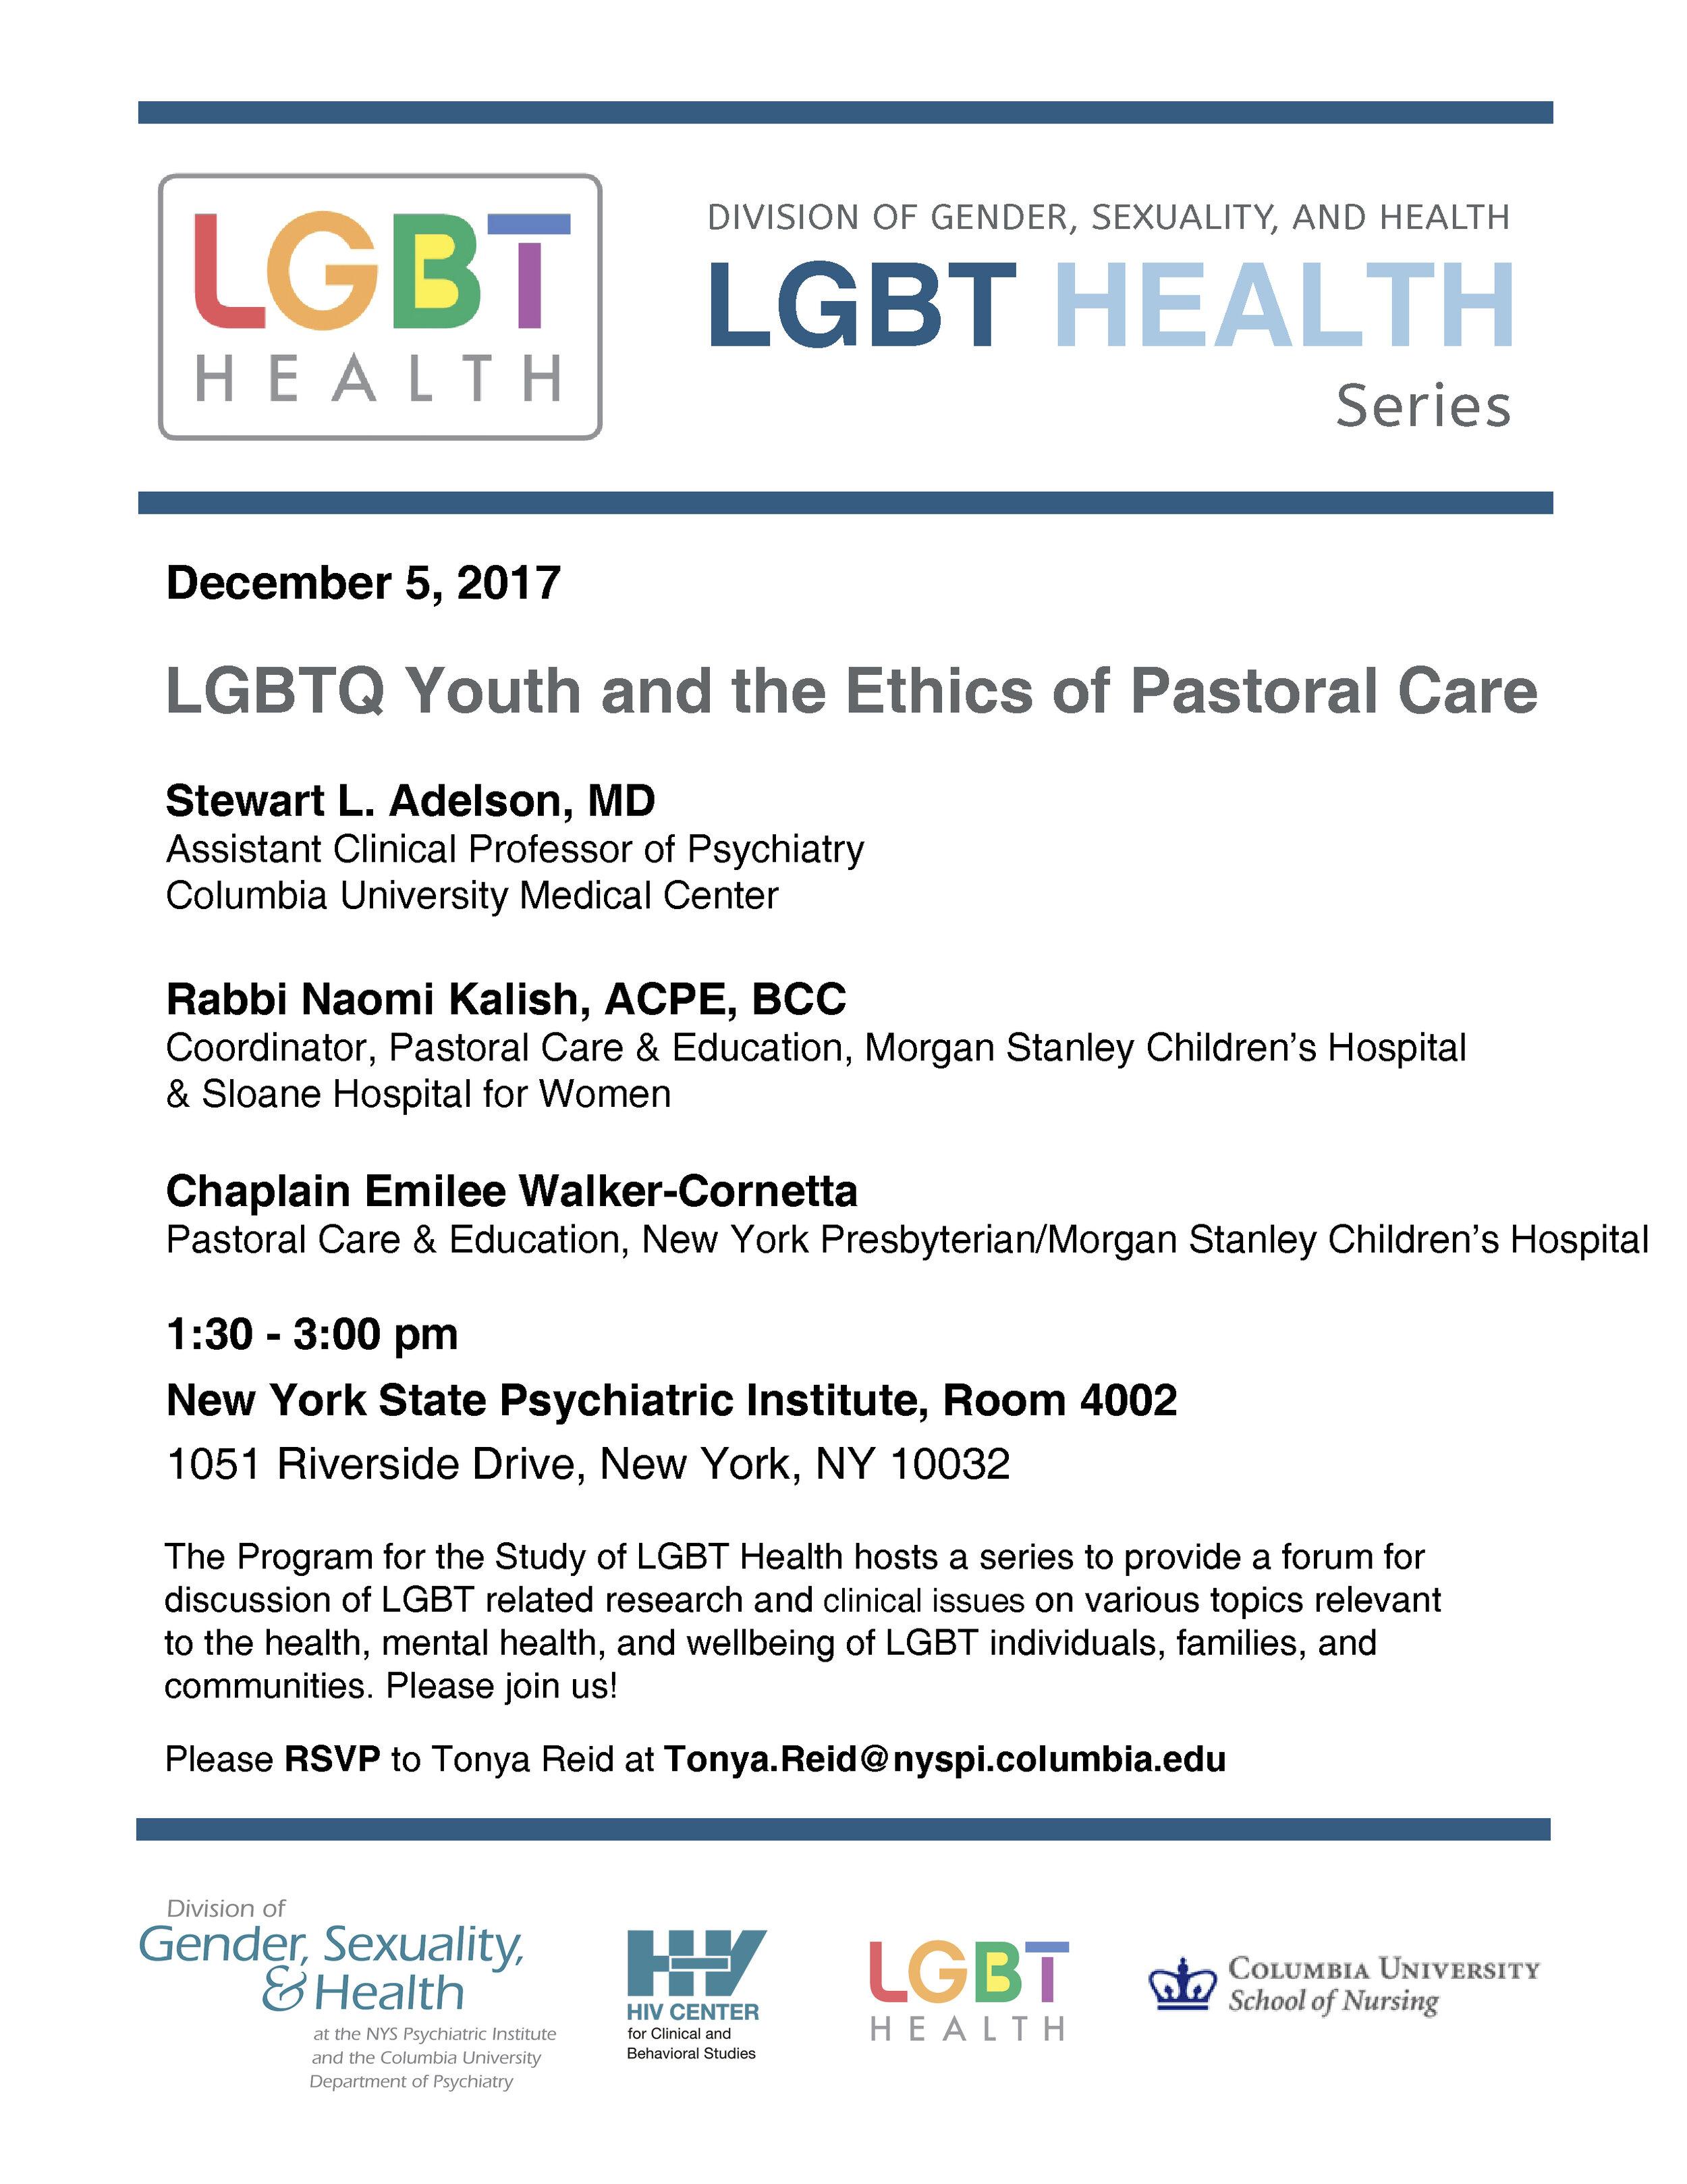 LGBT Health Series Dec 5 2017.jpg